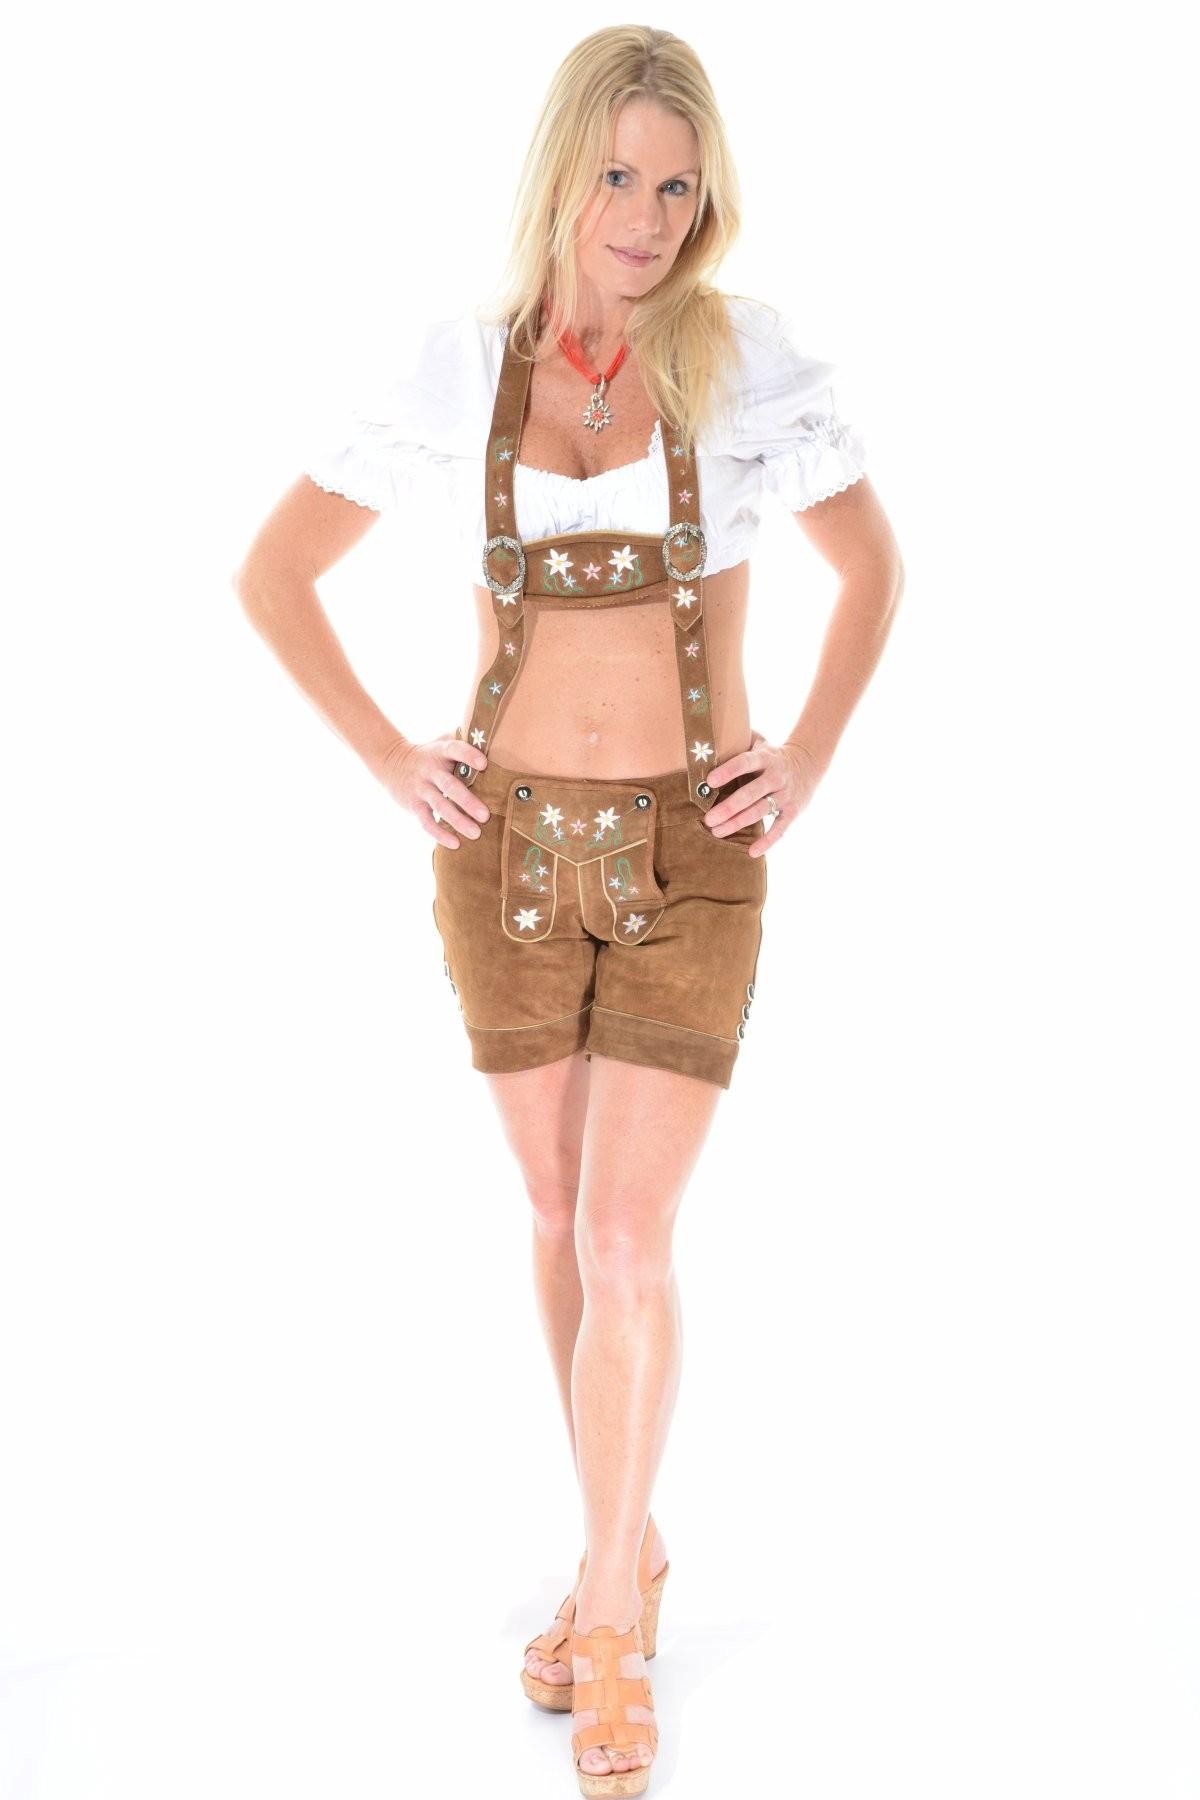 More Views  sc 1 st  Lederhosen4u & Womens Lederhosen | Female Lederhosen | Female Lederhosen Costume